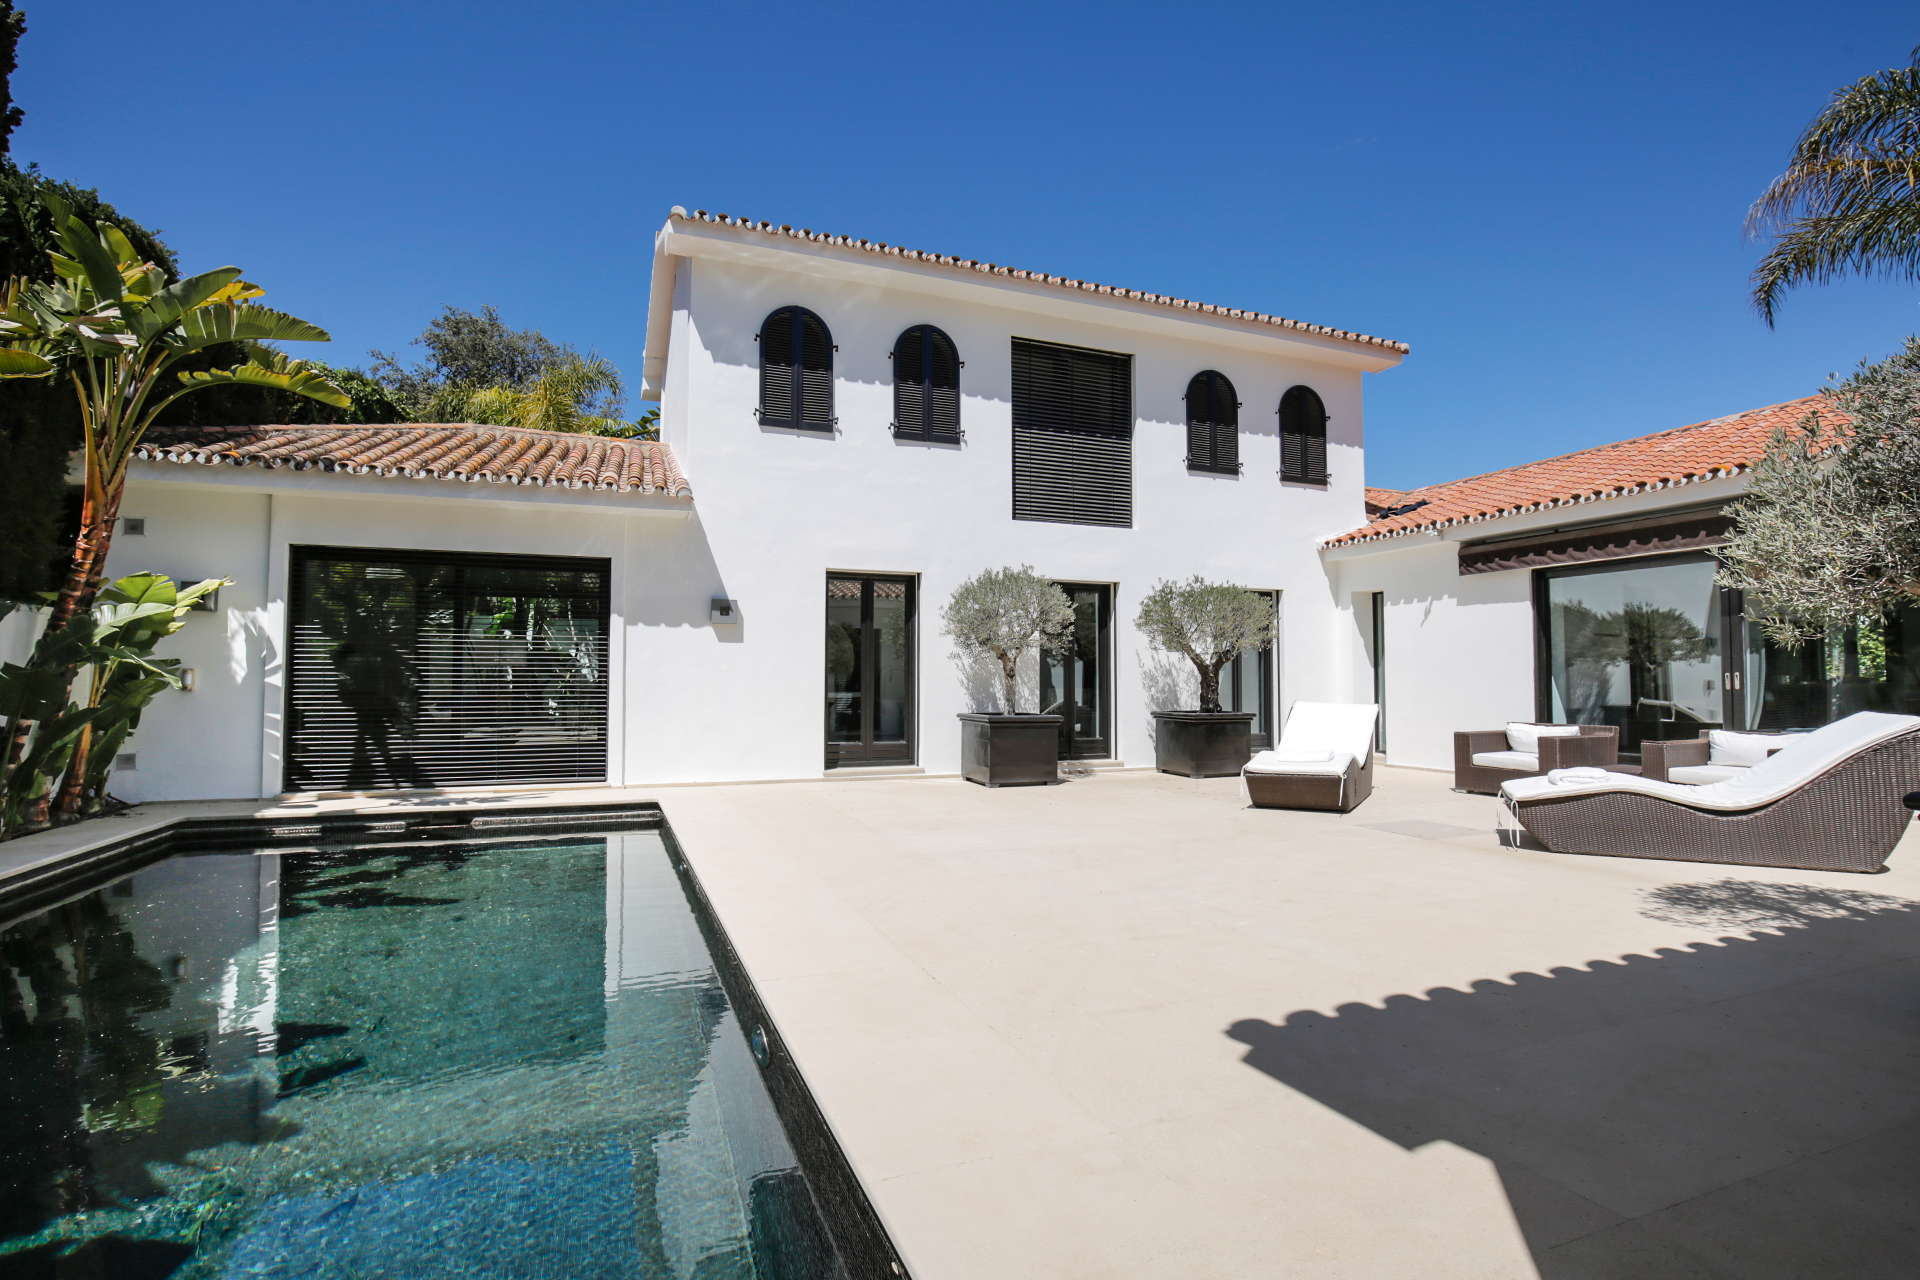 Villa for sale Los Monteros Playa, Marbella near the beach